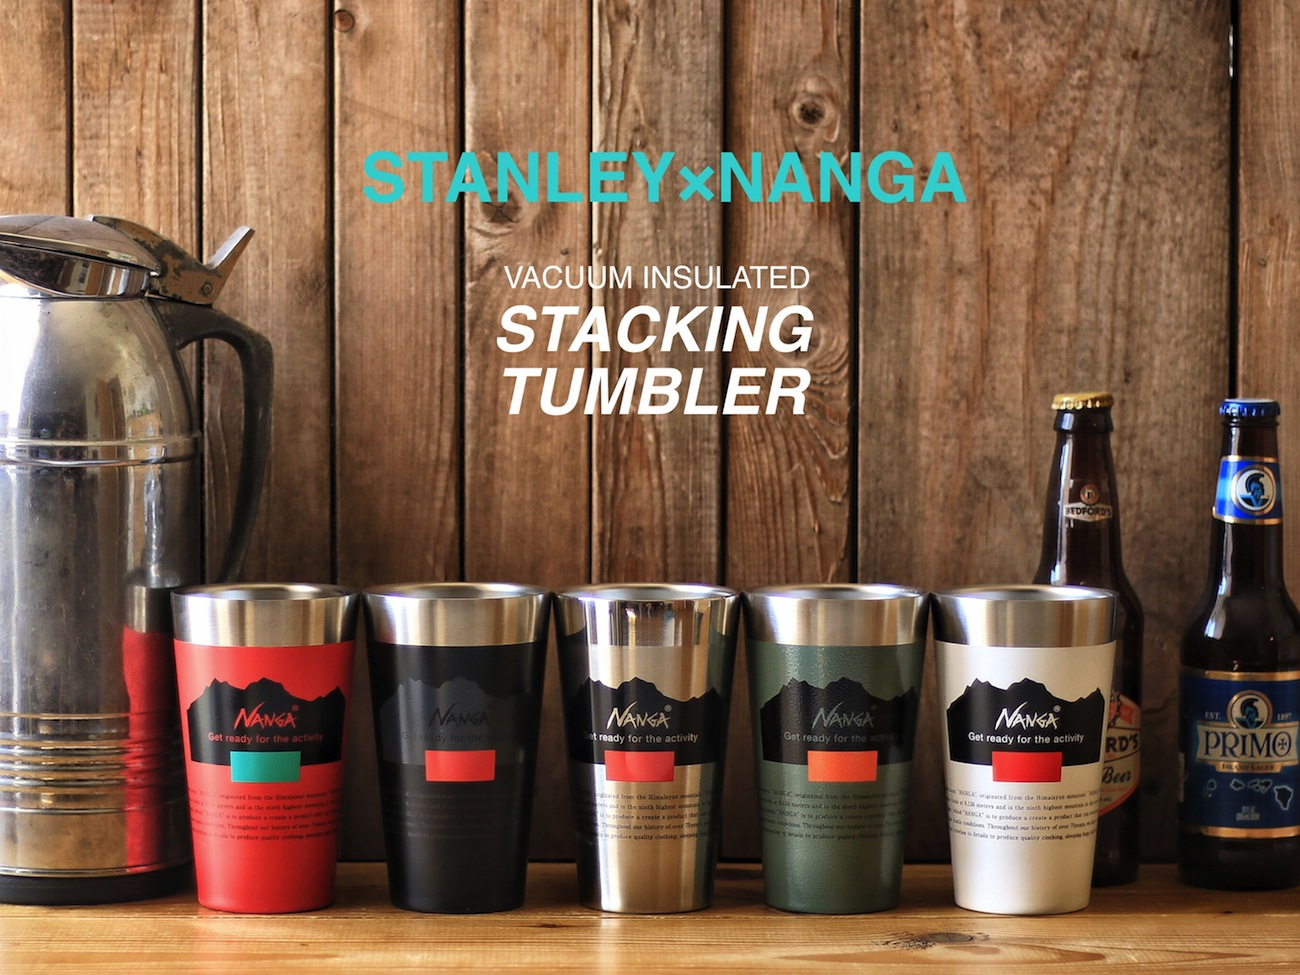 STANLEY×NANGA スタッキング真空パイント。パーティーやプレゼントにも。